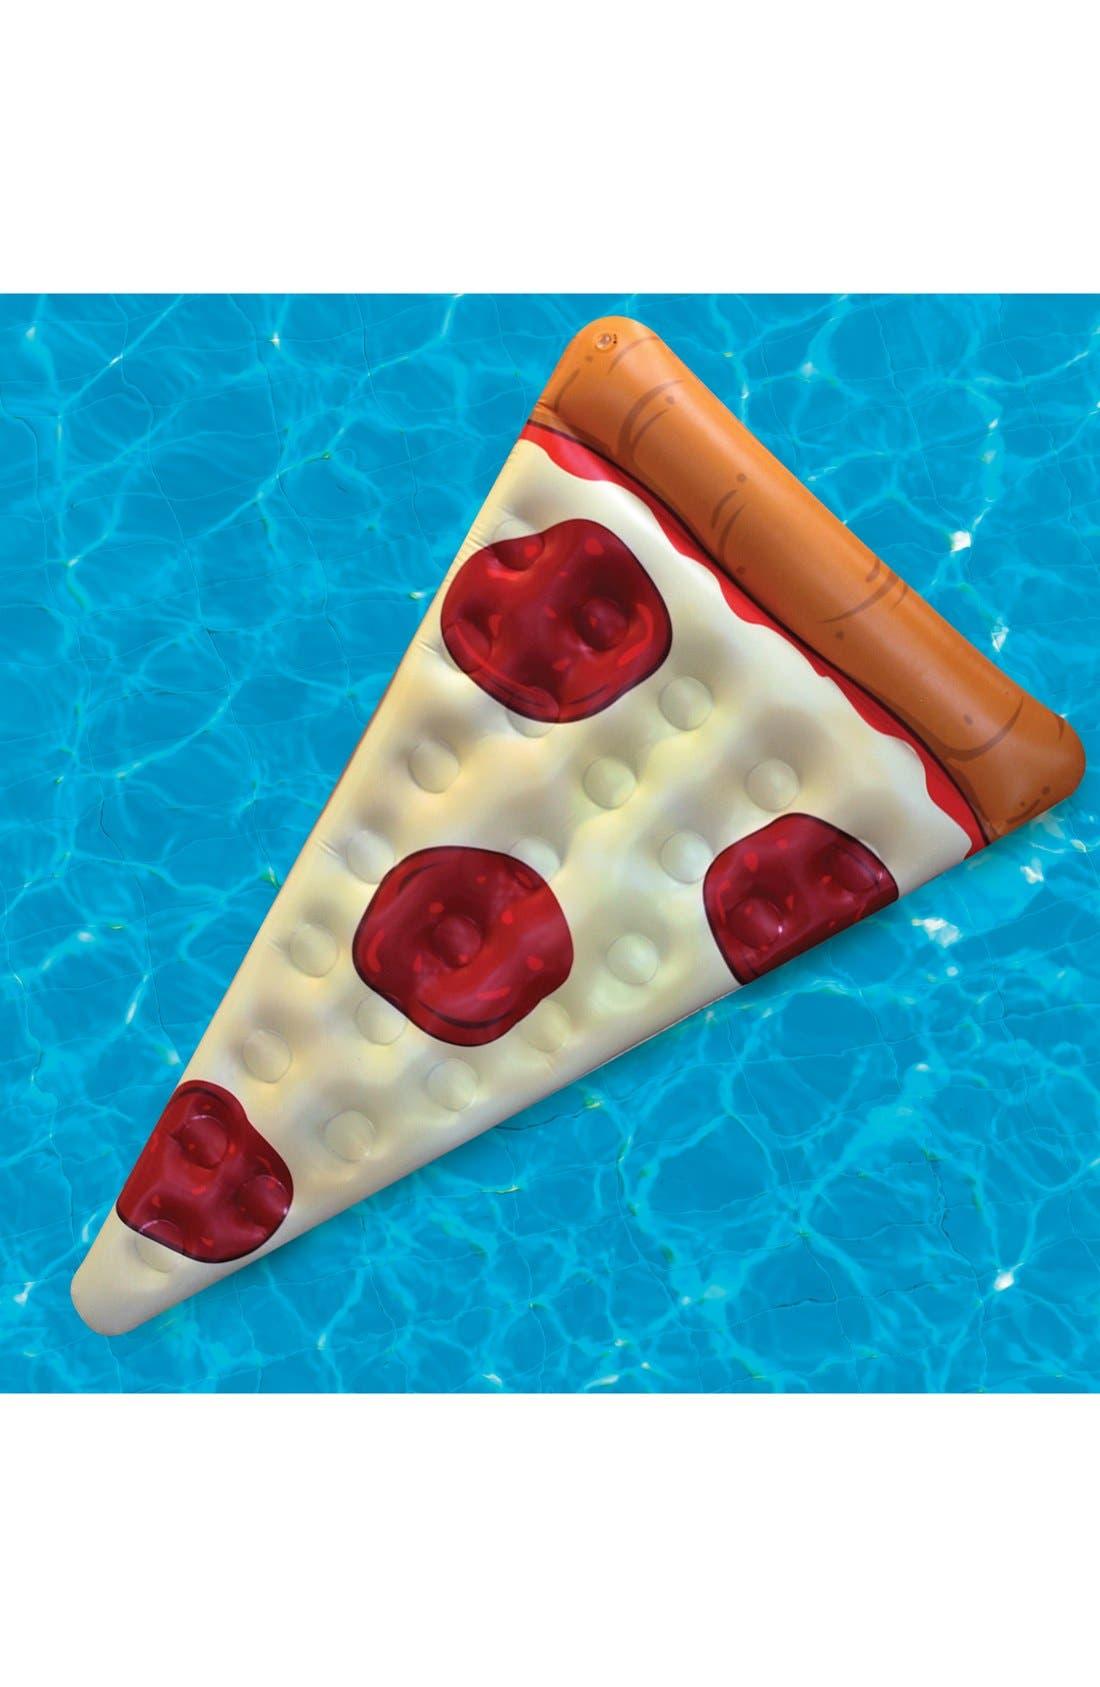 Alternate Image 2  - BigMouth Inc. Giant Pizza Slice Pool Float